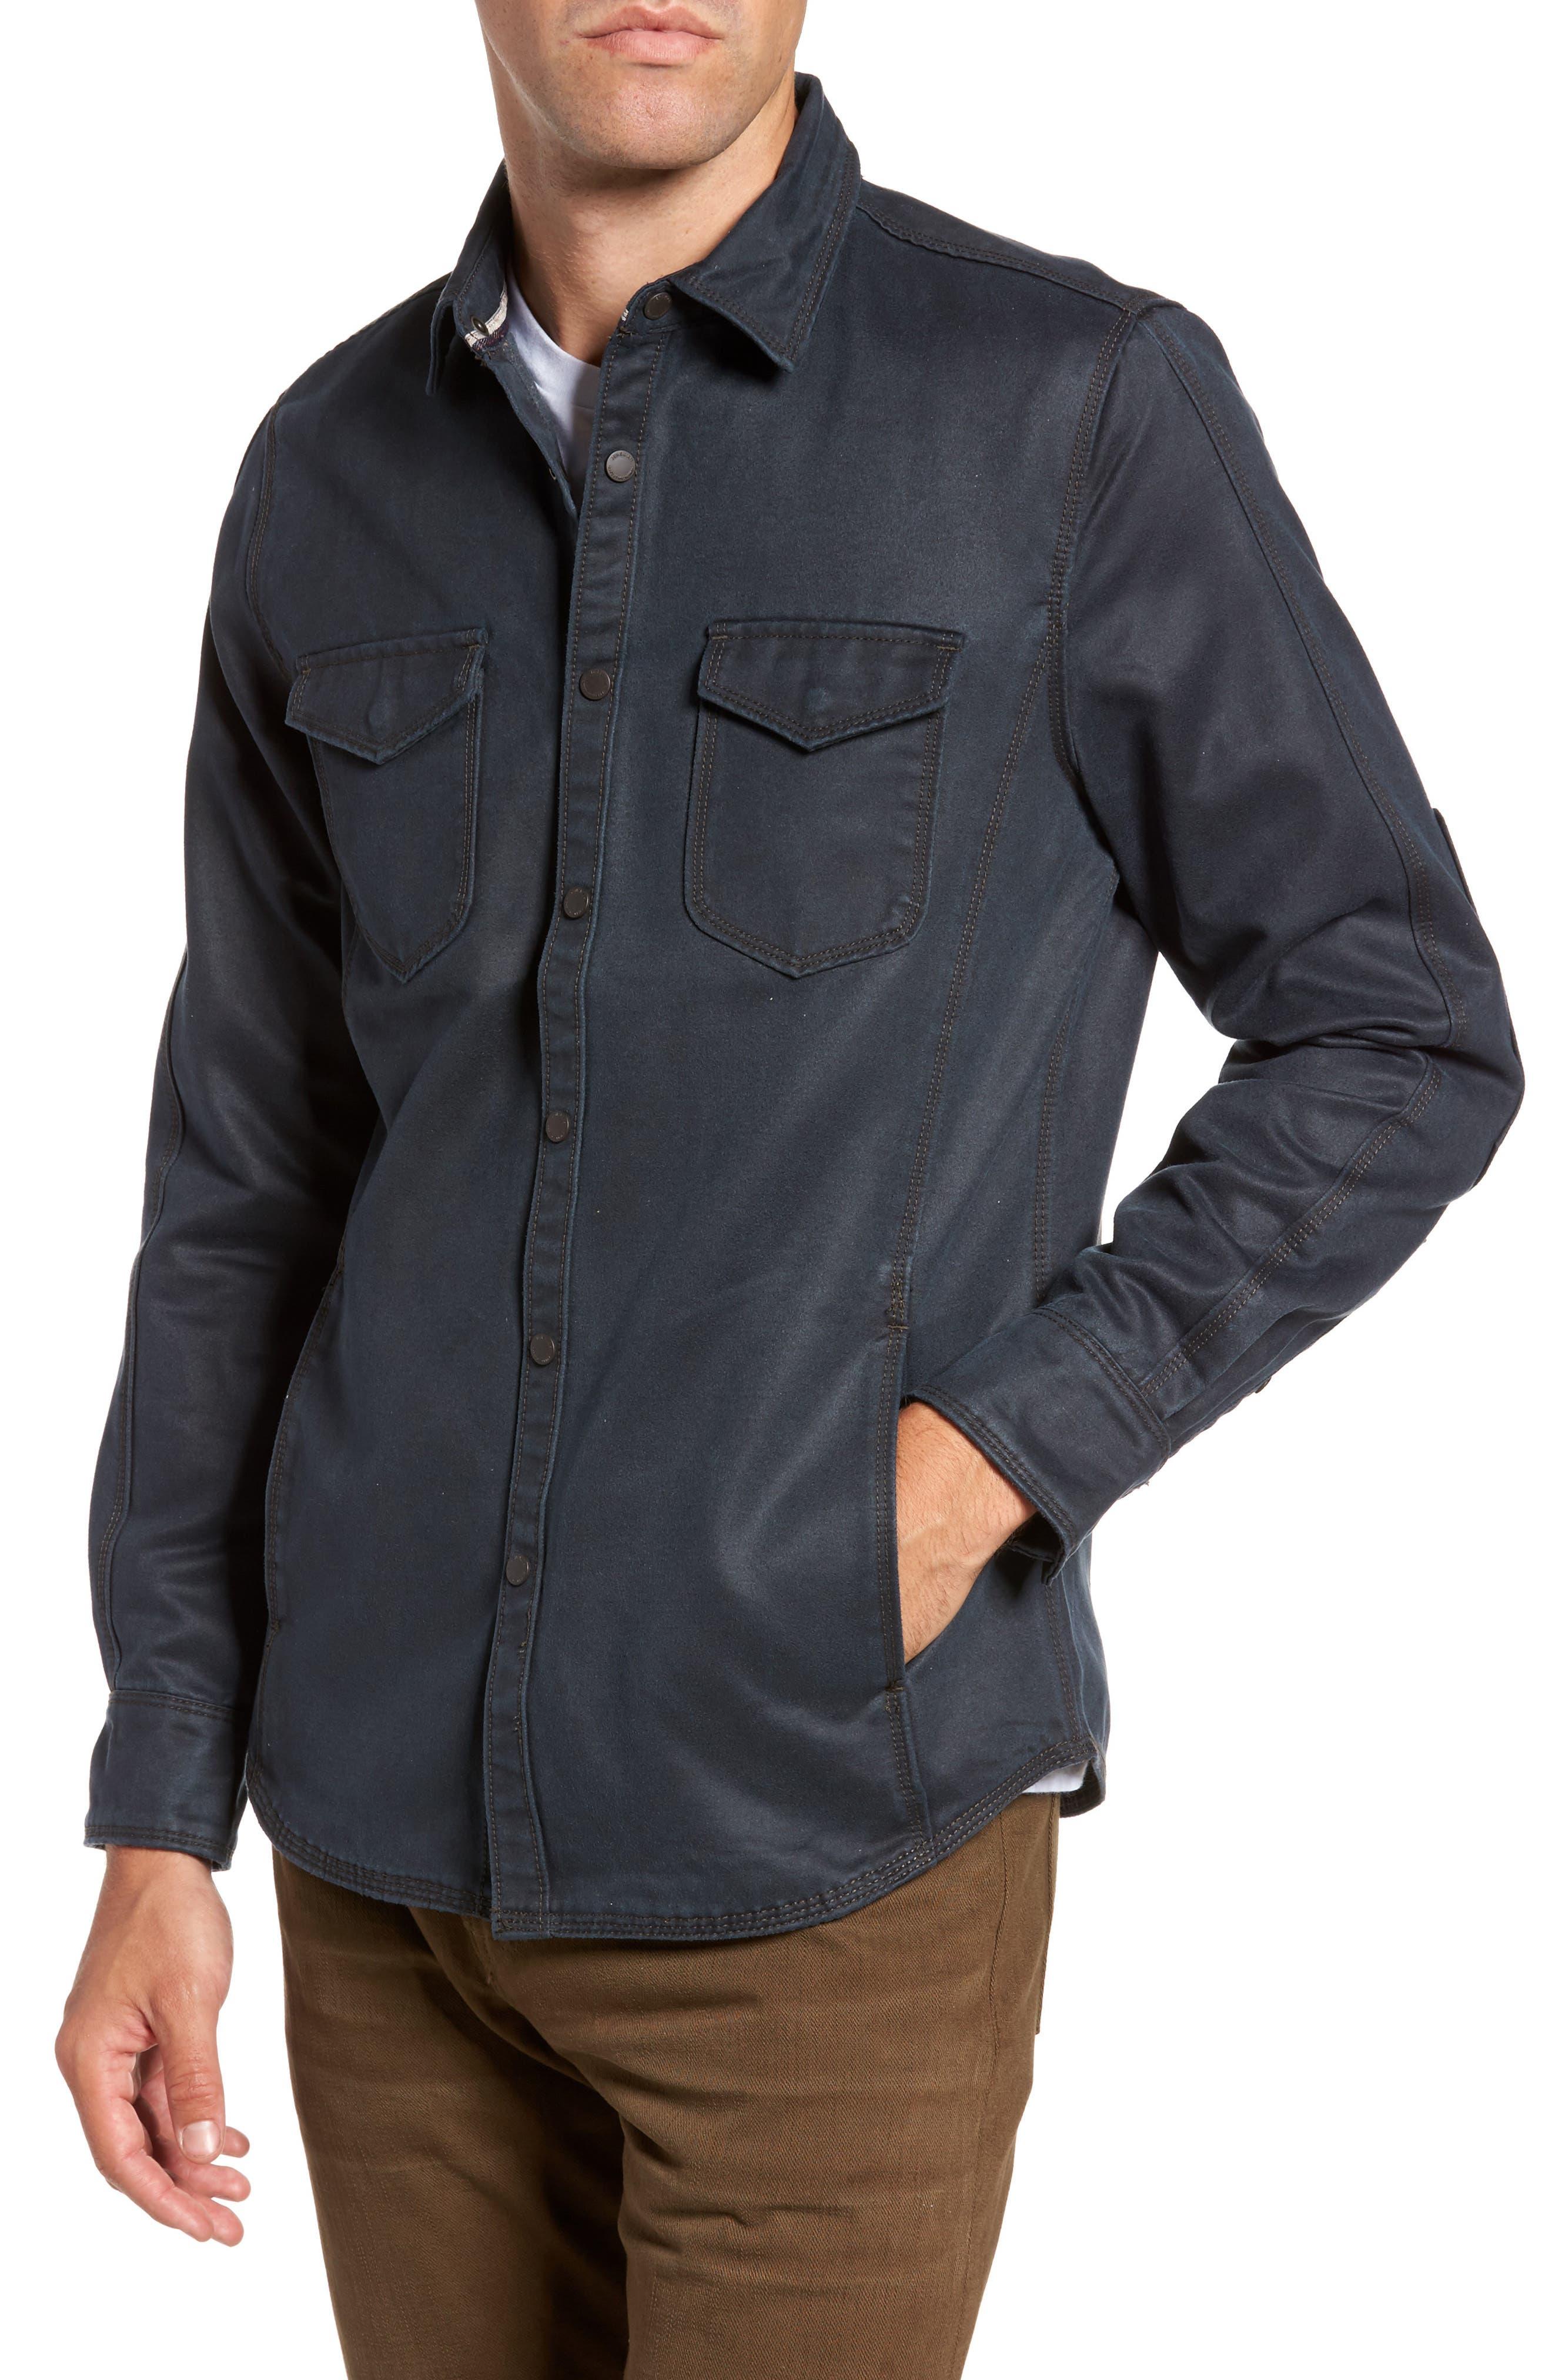 'Colt' Regular Fit Sueded Cotton Blend Shirt Jacket,                             Alternate thumbnail 4, color,                             INKWELL